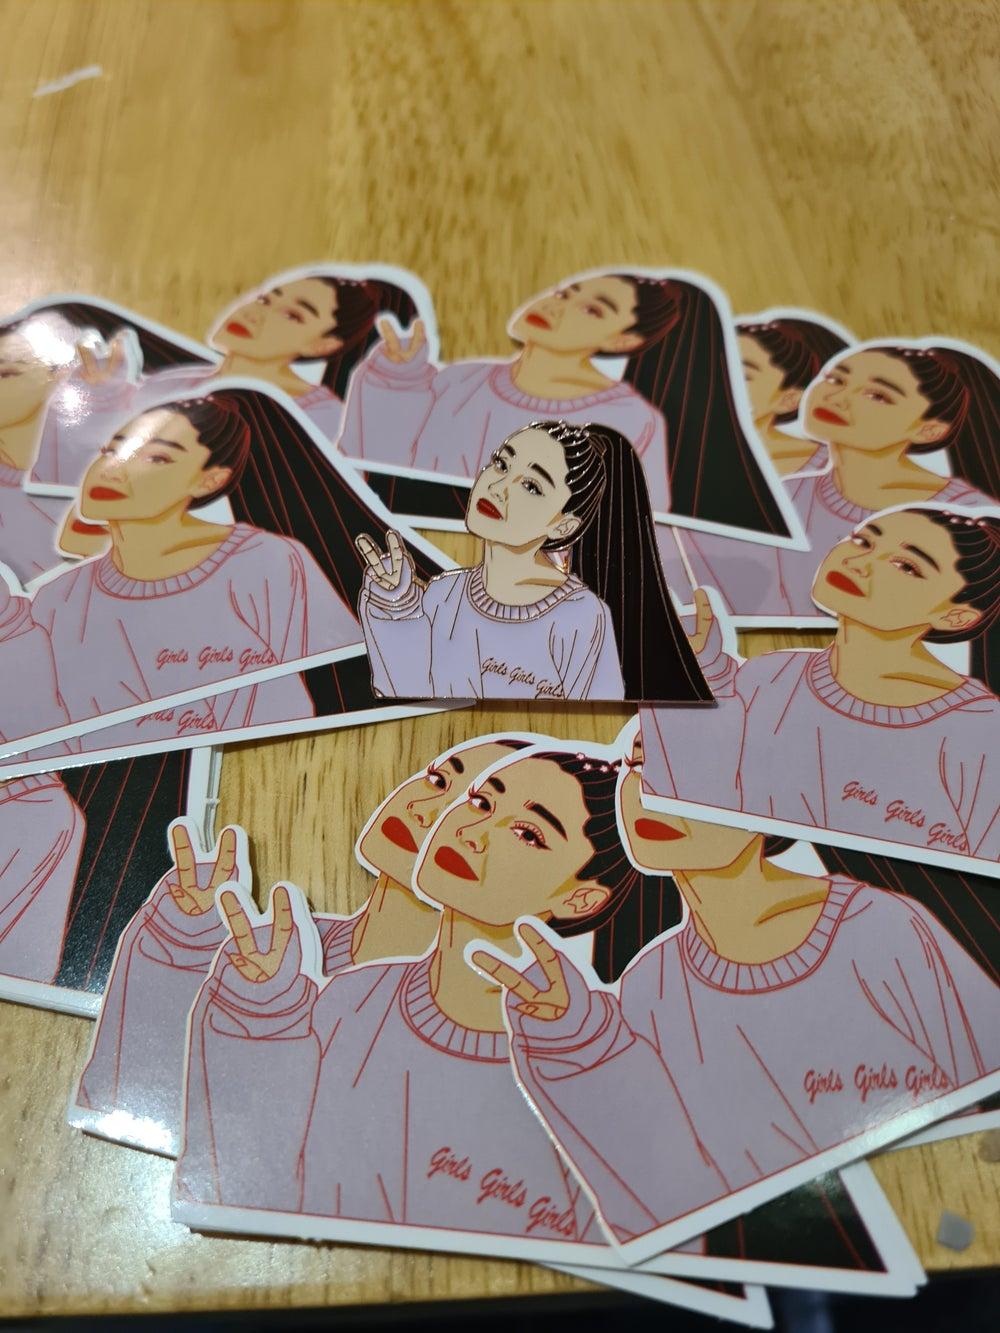 Ariana Grande - Limited Edition Pin badge